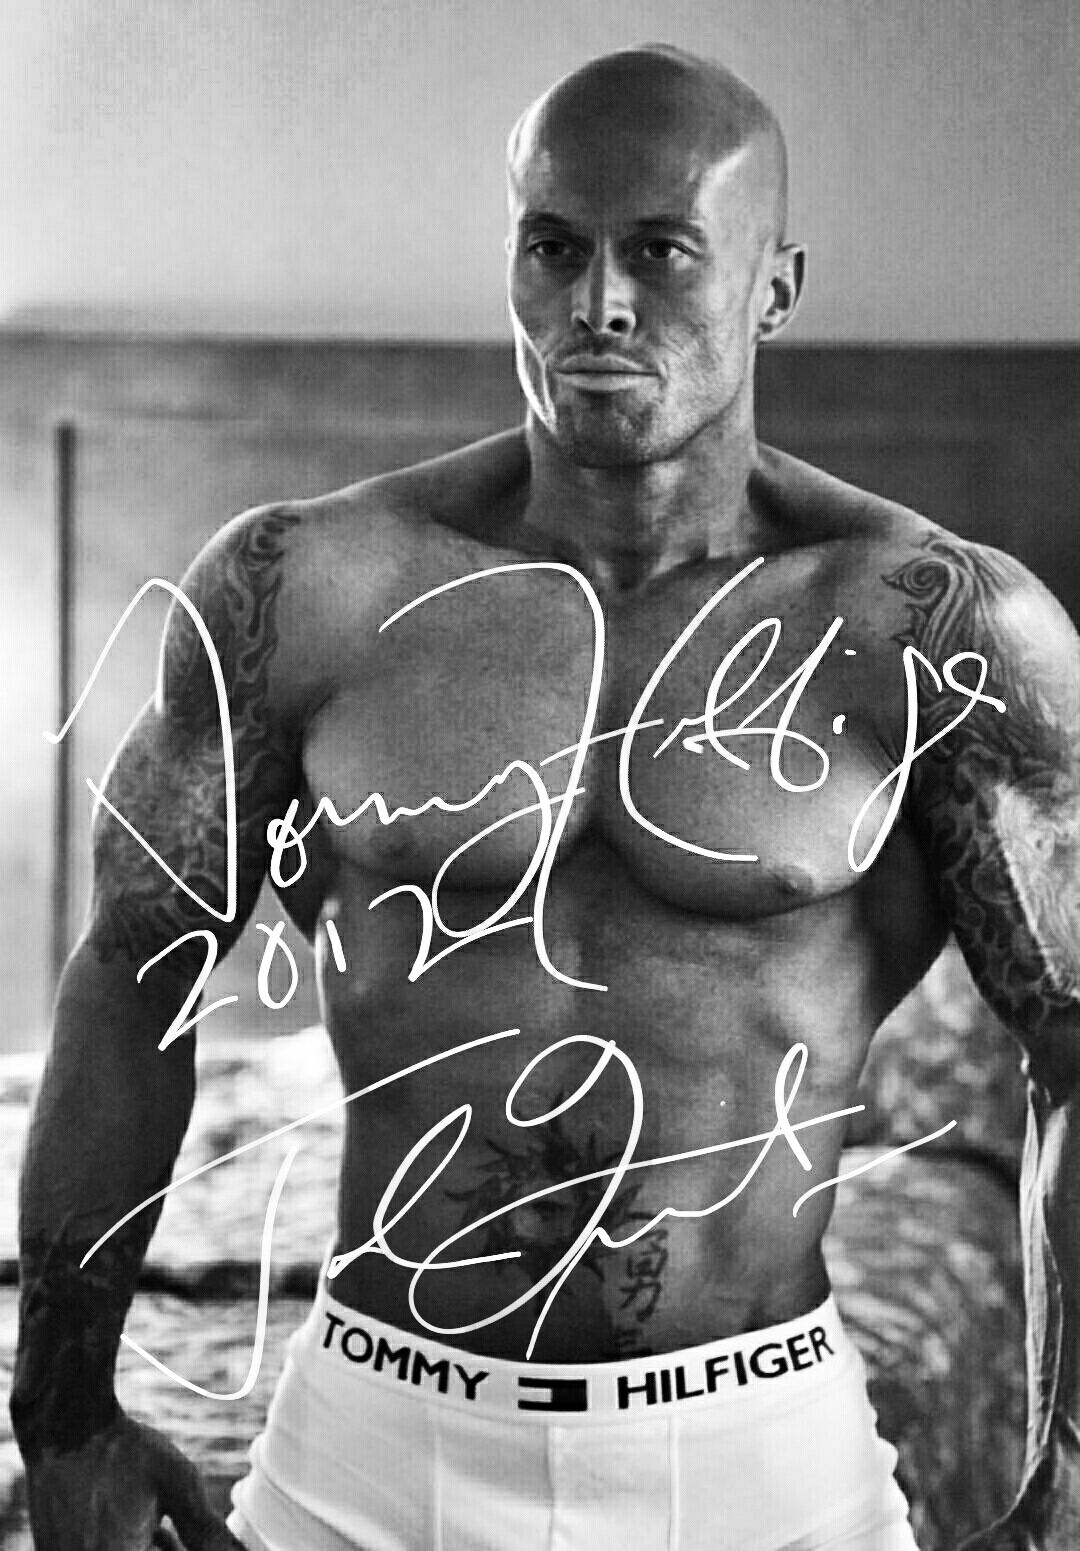 RT Cover & Physique Model John Joseph Quinlan 2012 Tommy Hilfiger Autograph #JohnQuinlan